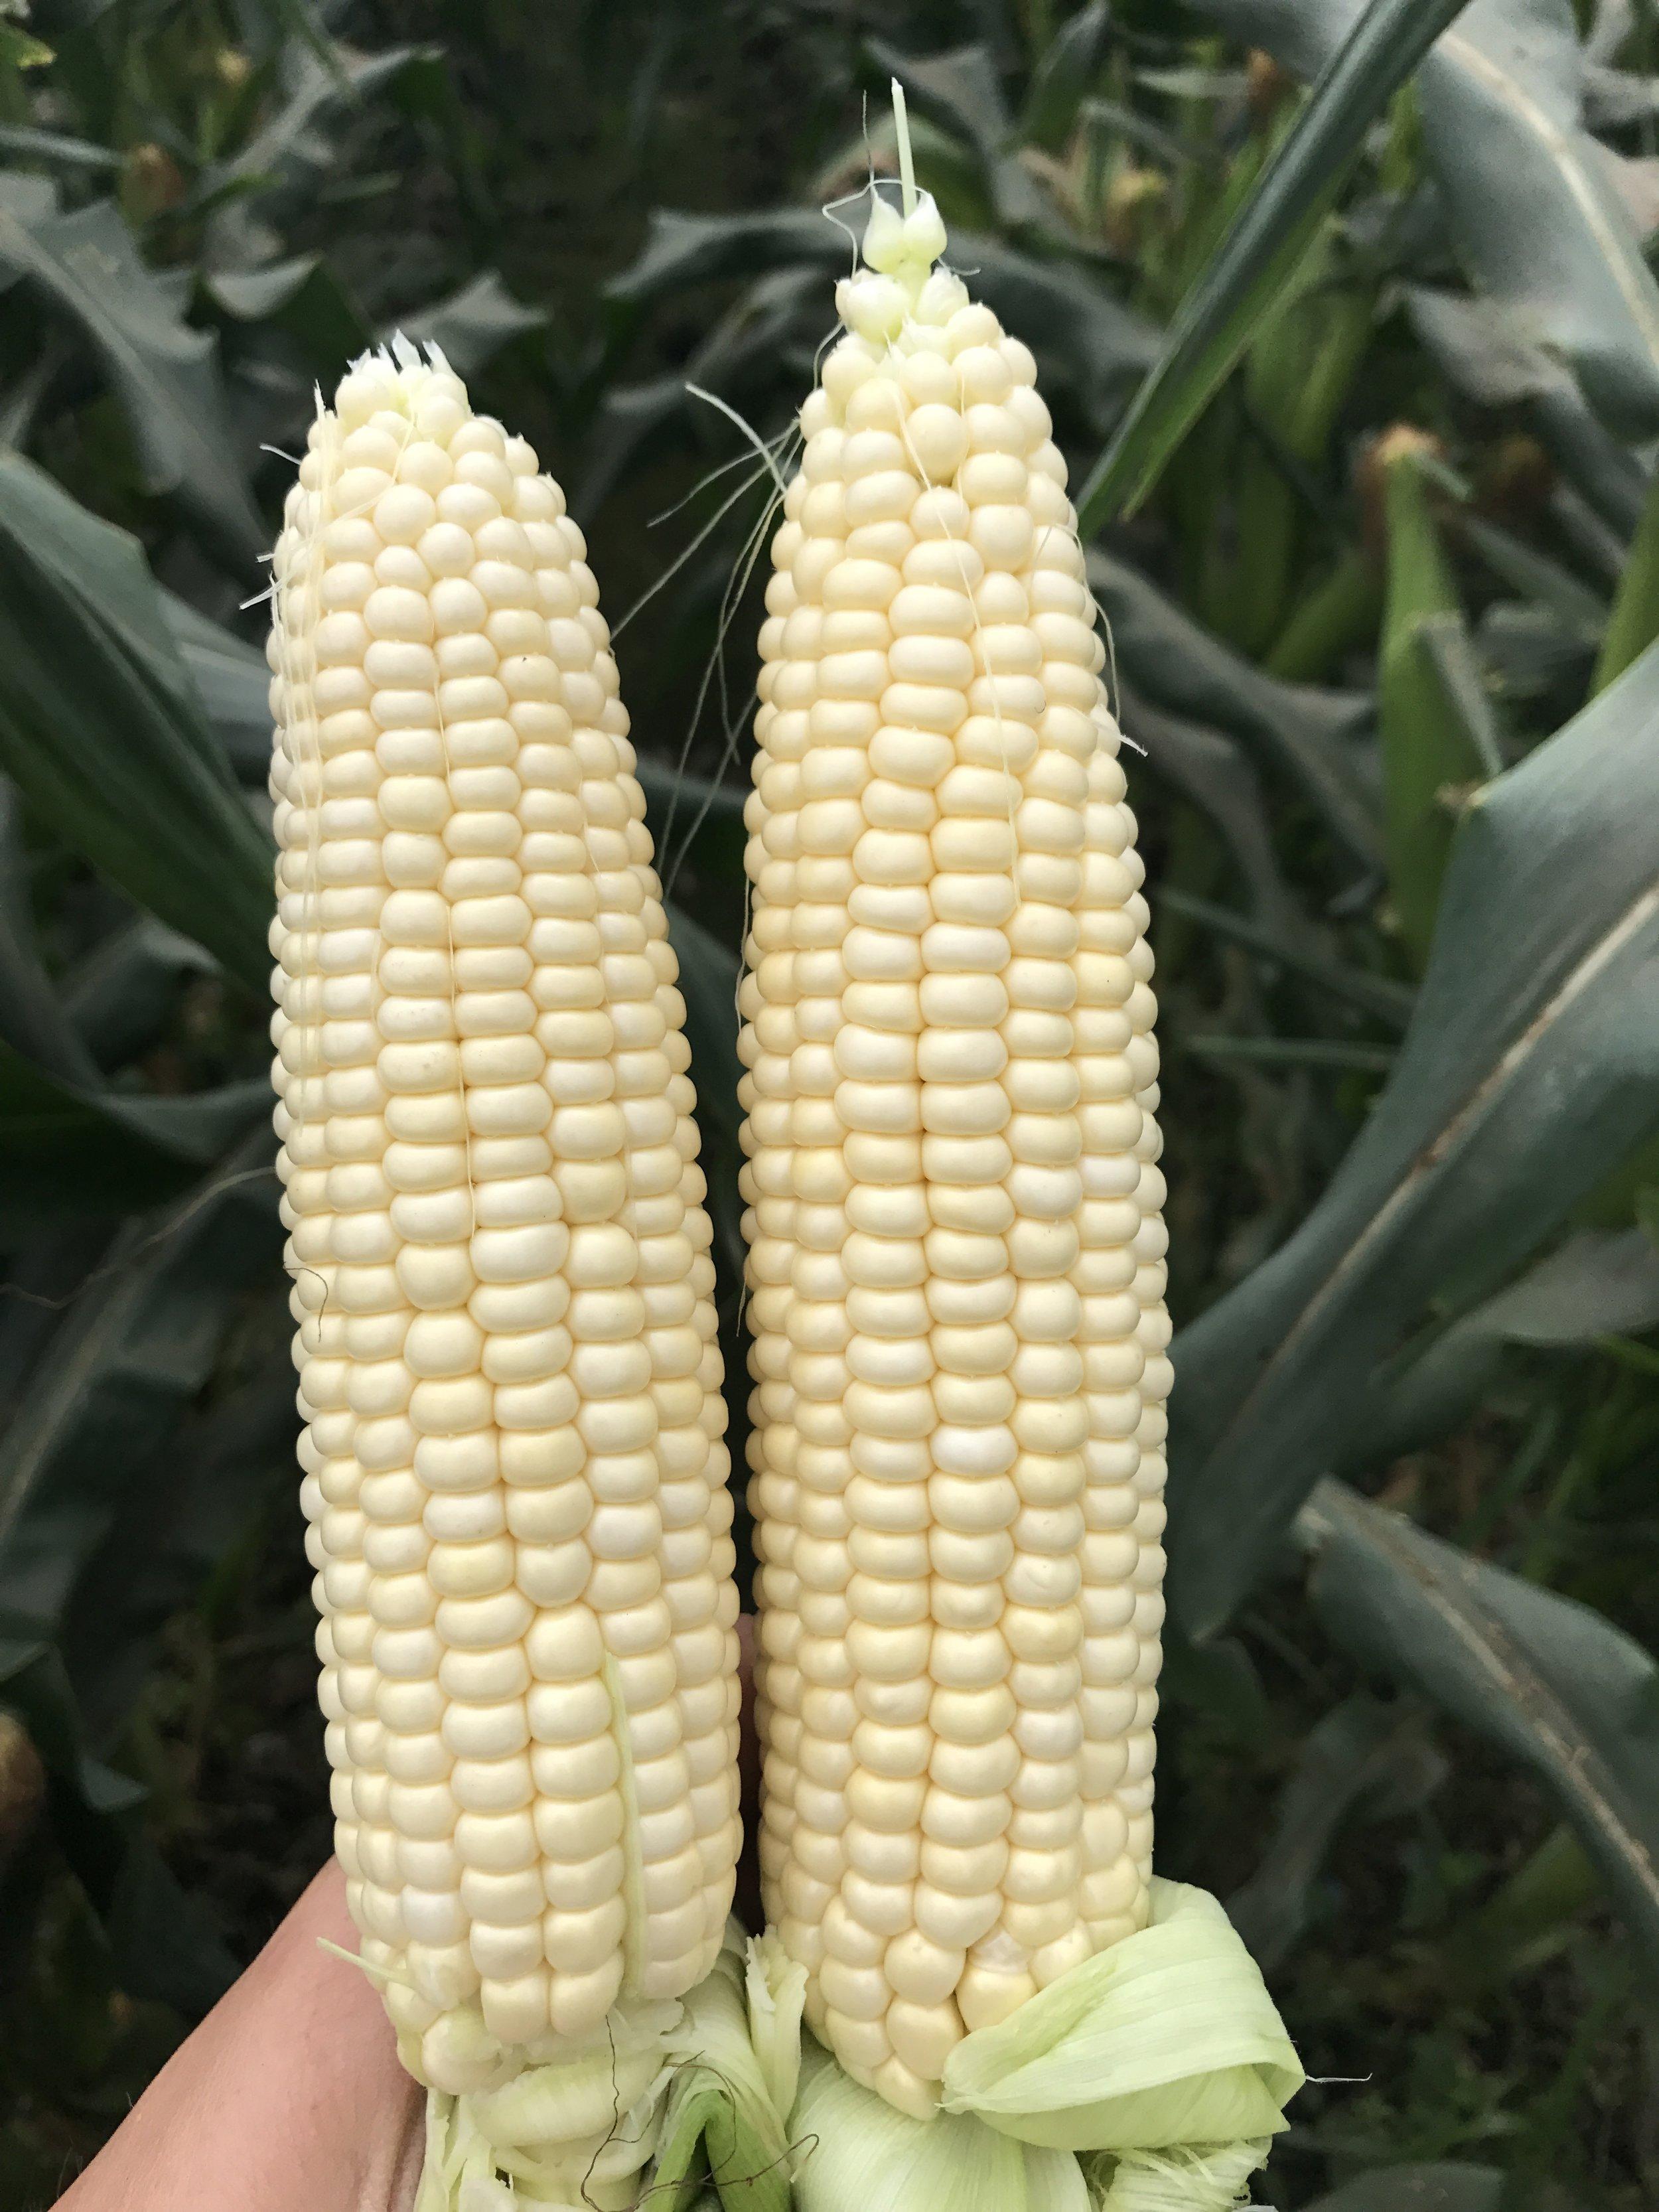 Two Florida Fresh Winter White Sweet Corn